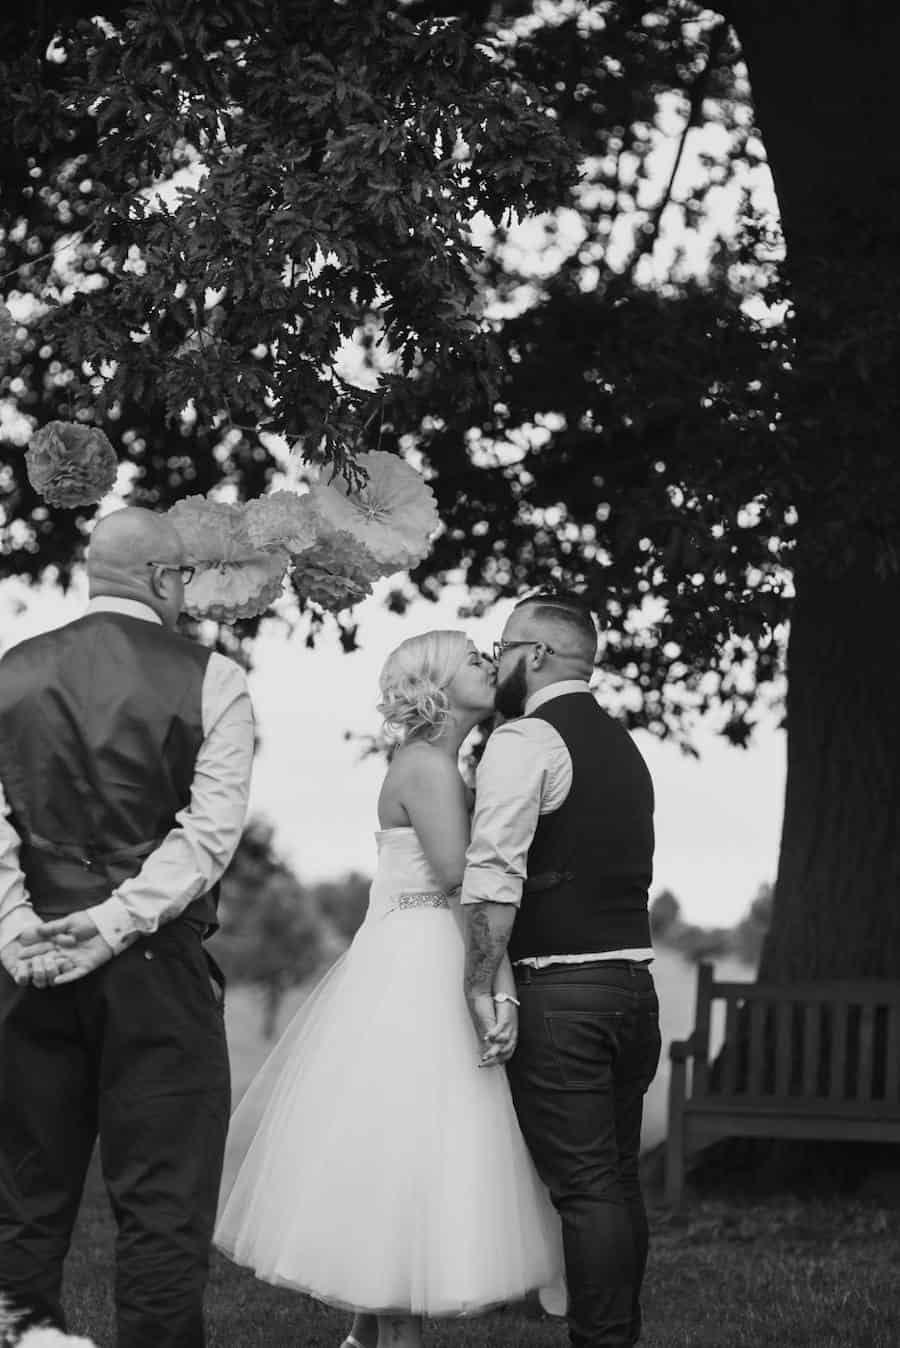 outdoor ceremony under the oak tree at Bawdon Lodge Farm - Sami Tipi Wedding at Bawdon Lodge Farm